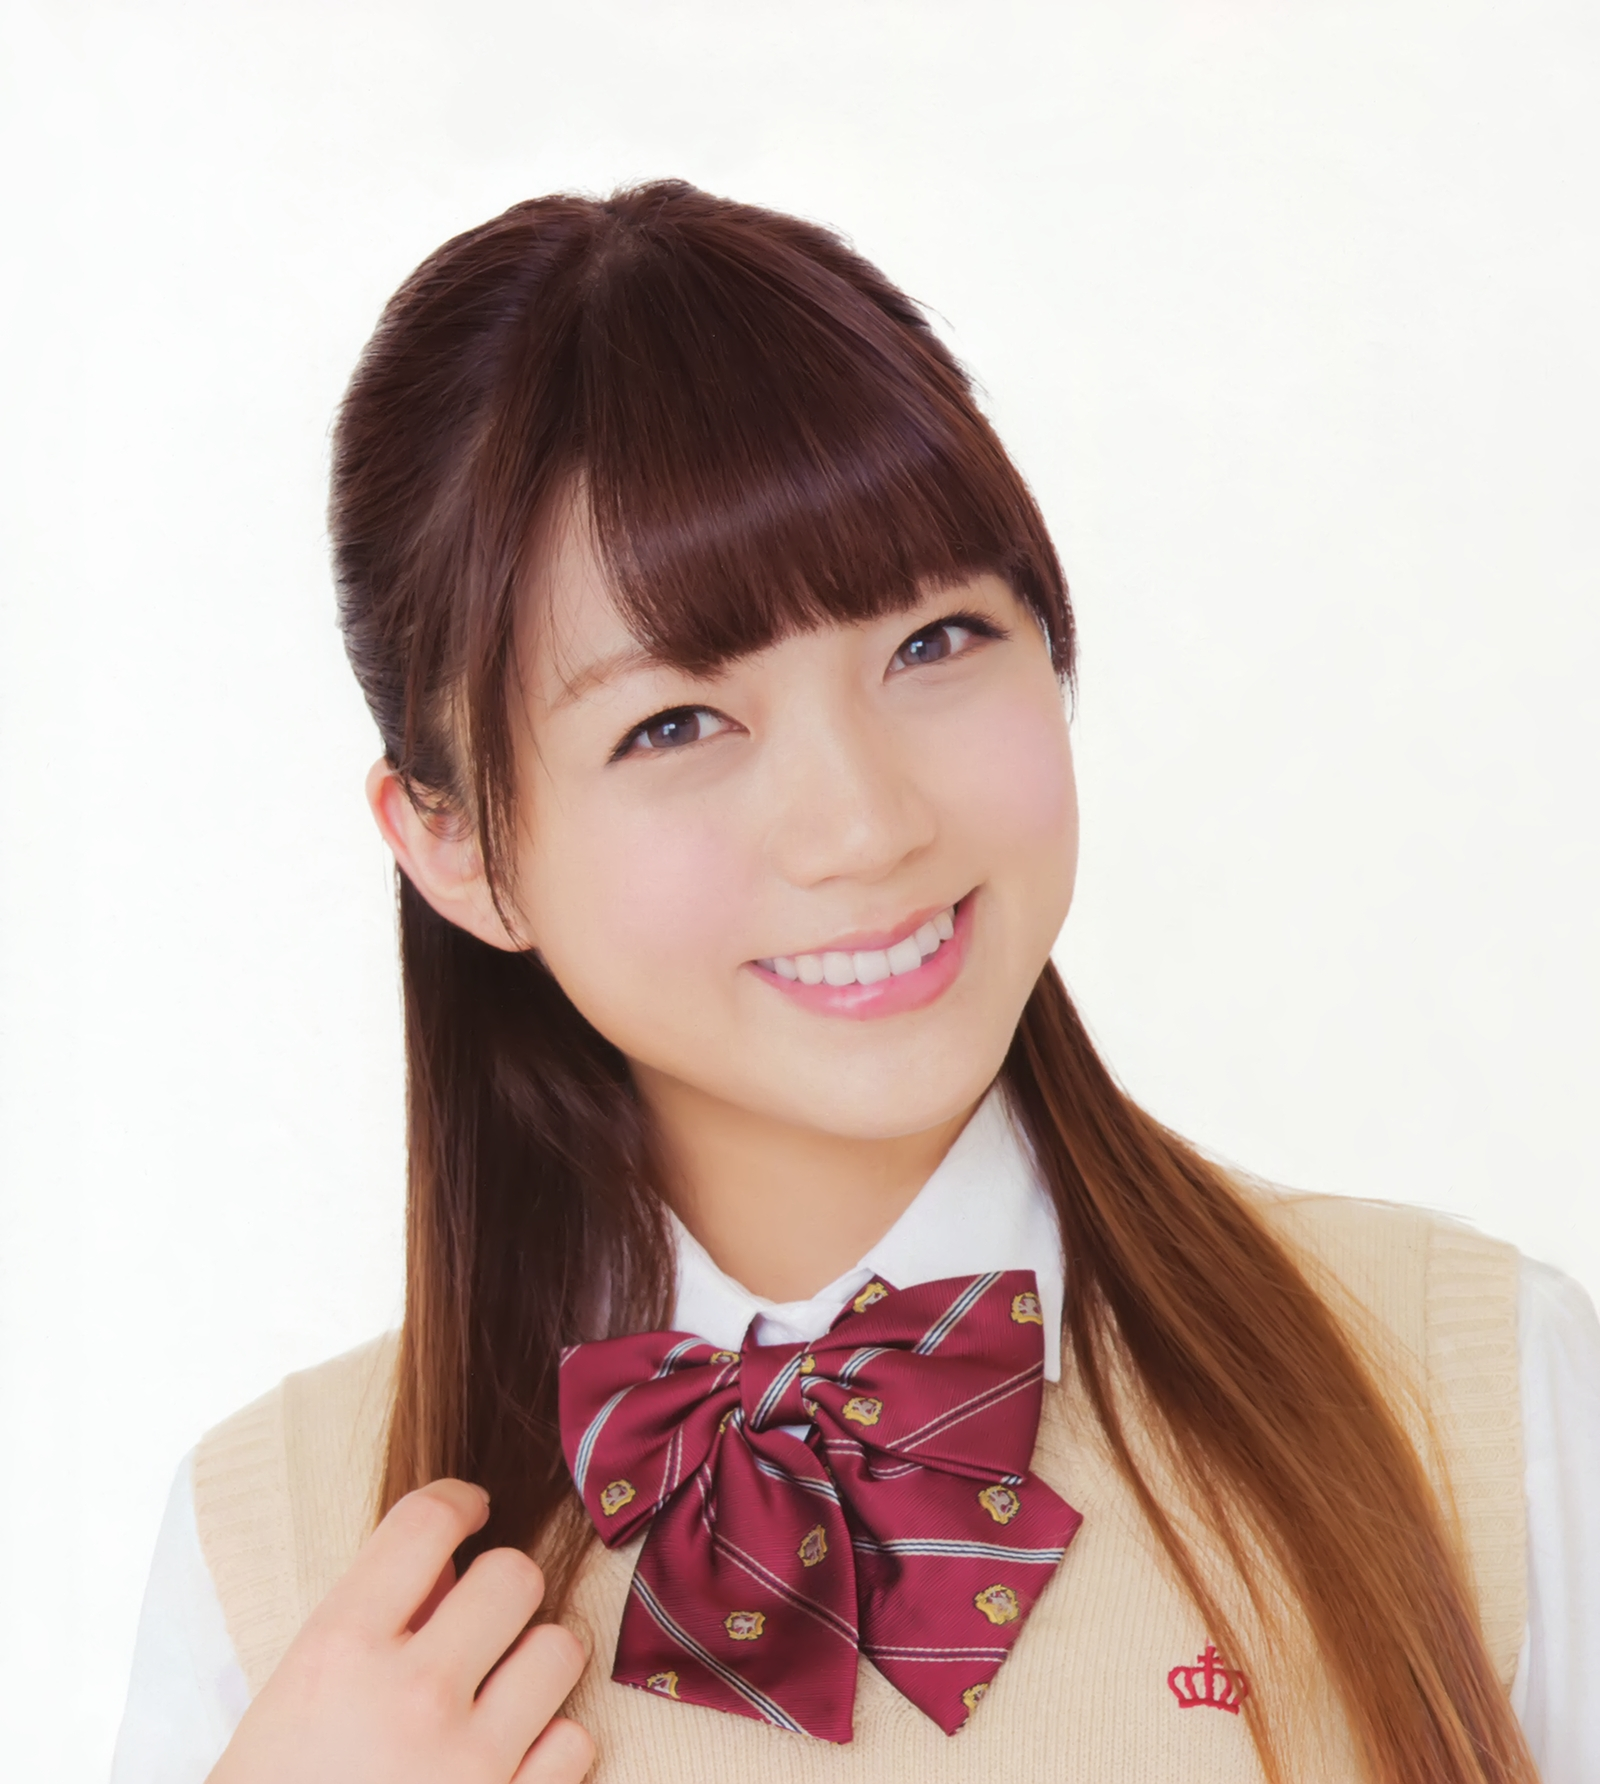 Suzuko Mimori Love Live Wiki Fandom Powered By Wikia